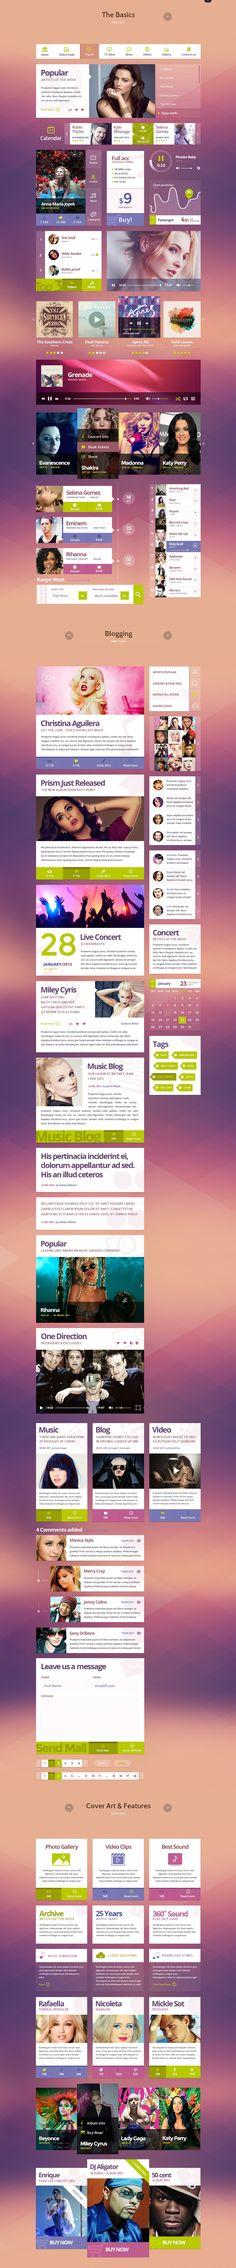 Funky Tunes UI Kit #graphics #web #design  #Responsive #Design #WebDesign #UI #UX #GUI #Brand #marketing